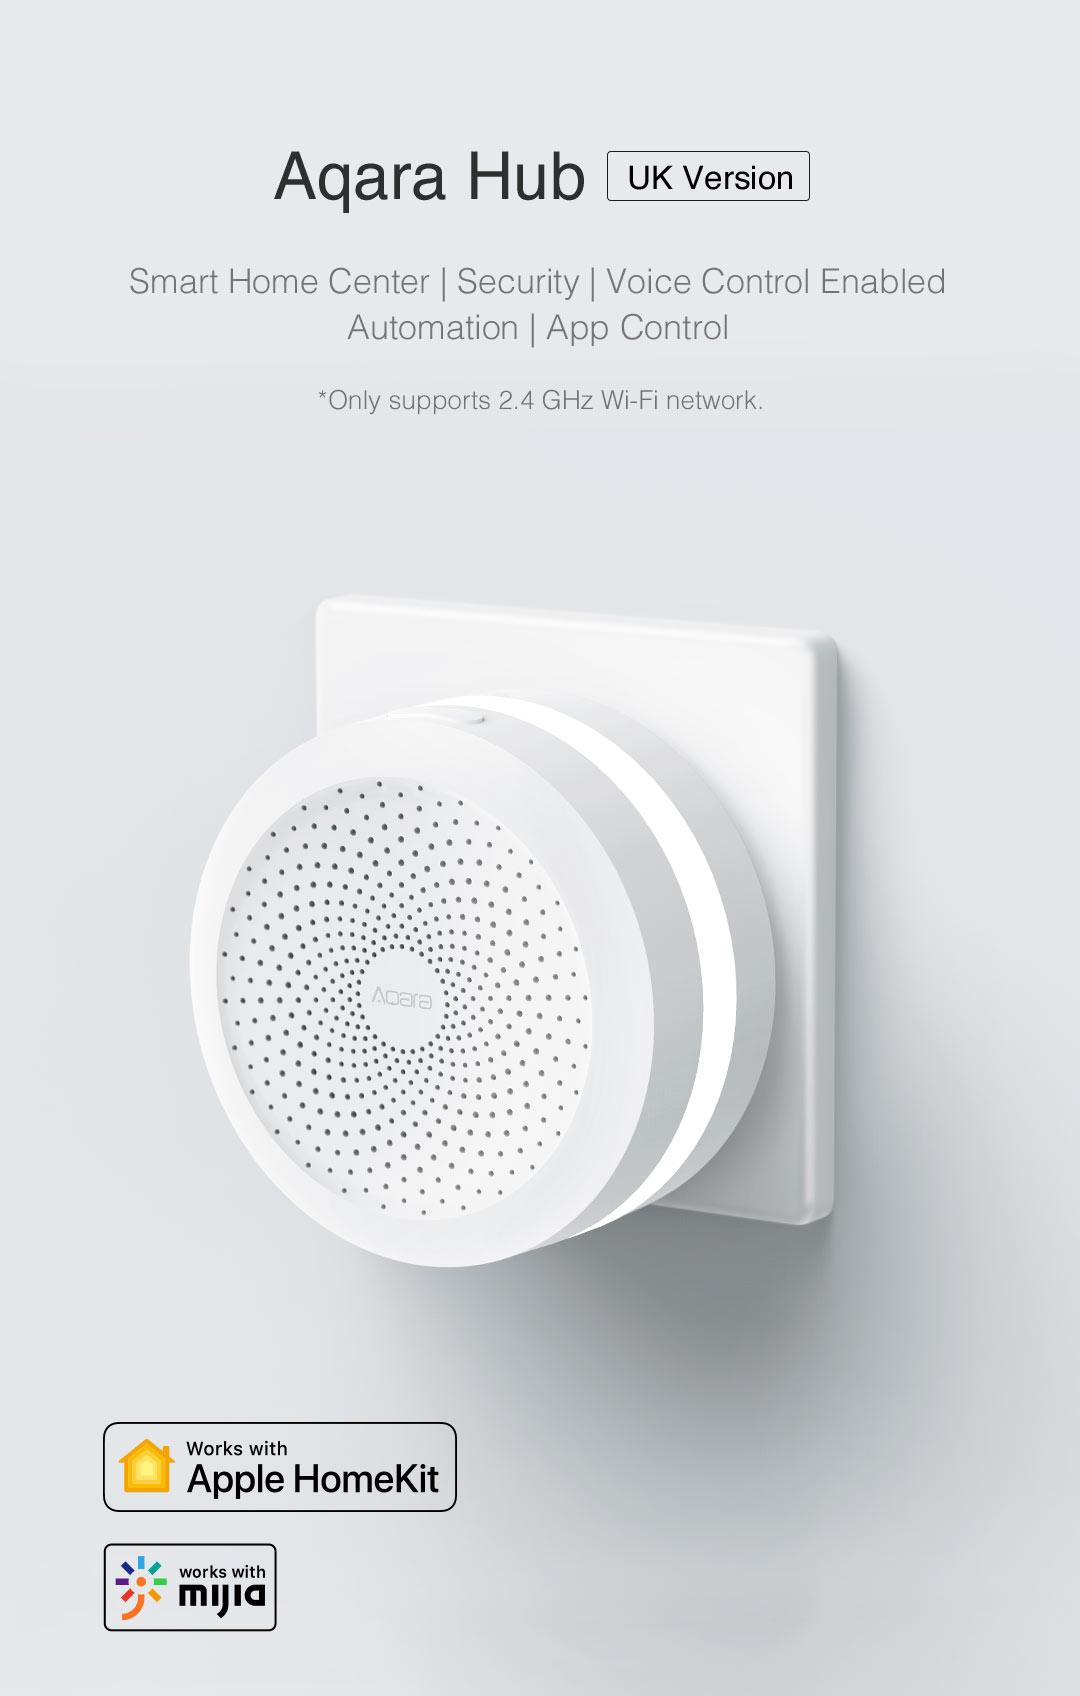 Aqara Hub UK version - homekit smart home hub that works with Apple HomeKit, Google Assistant and Mijia